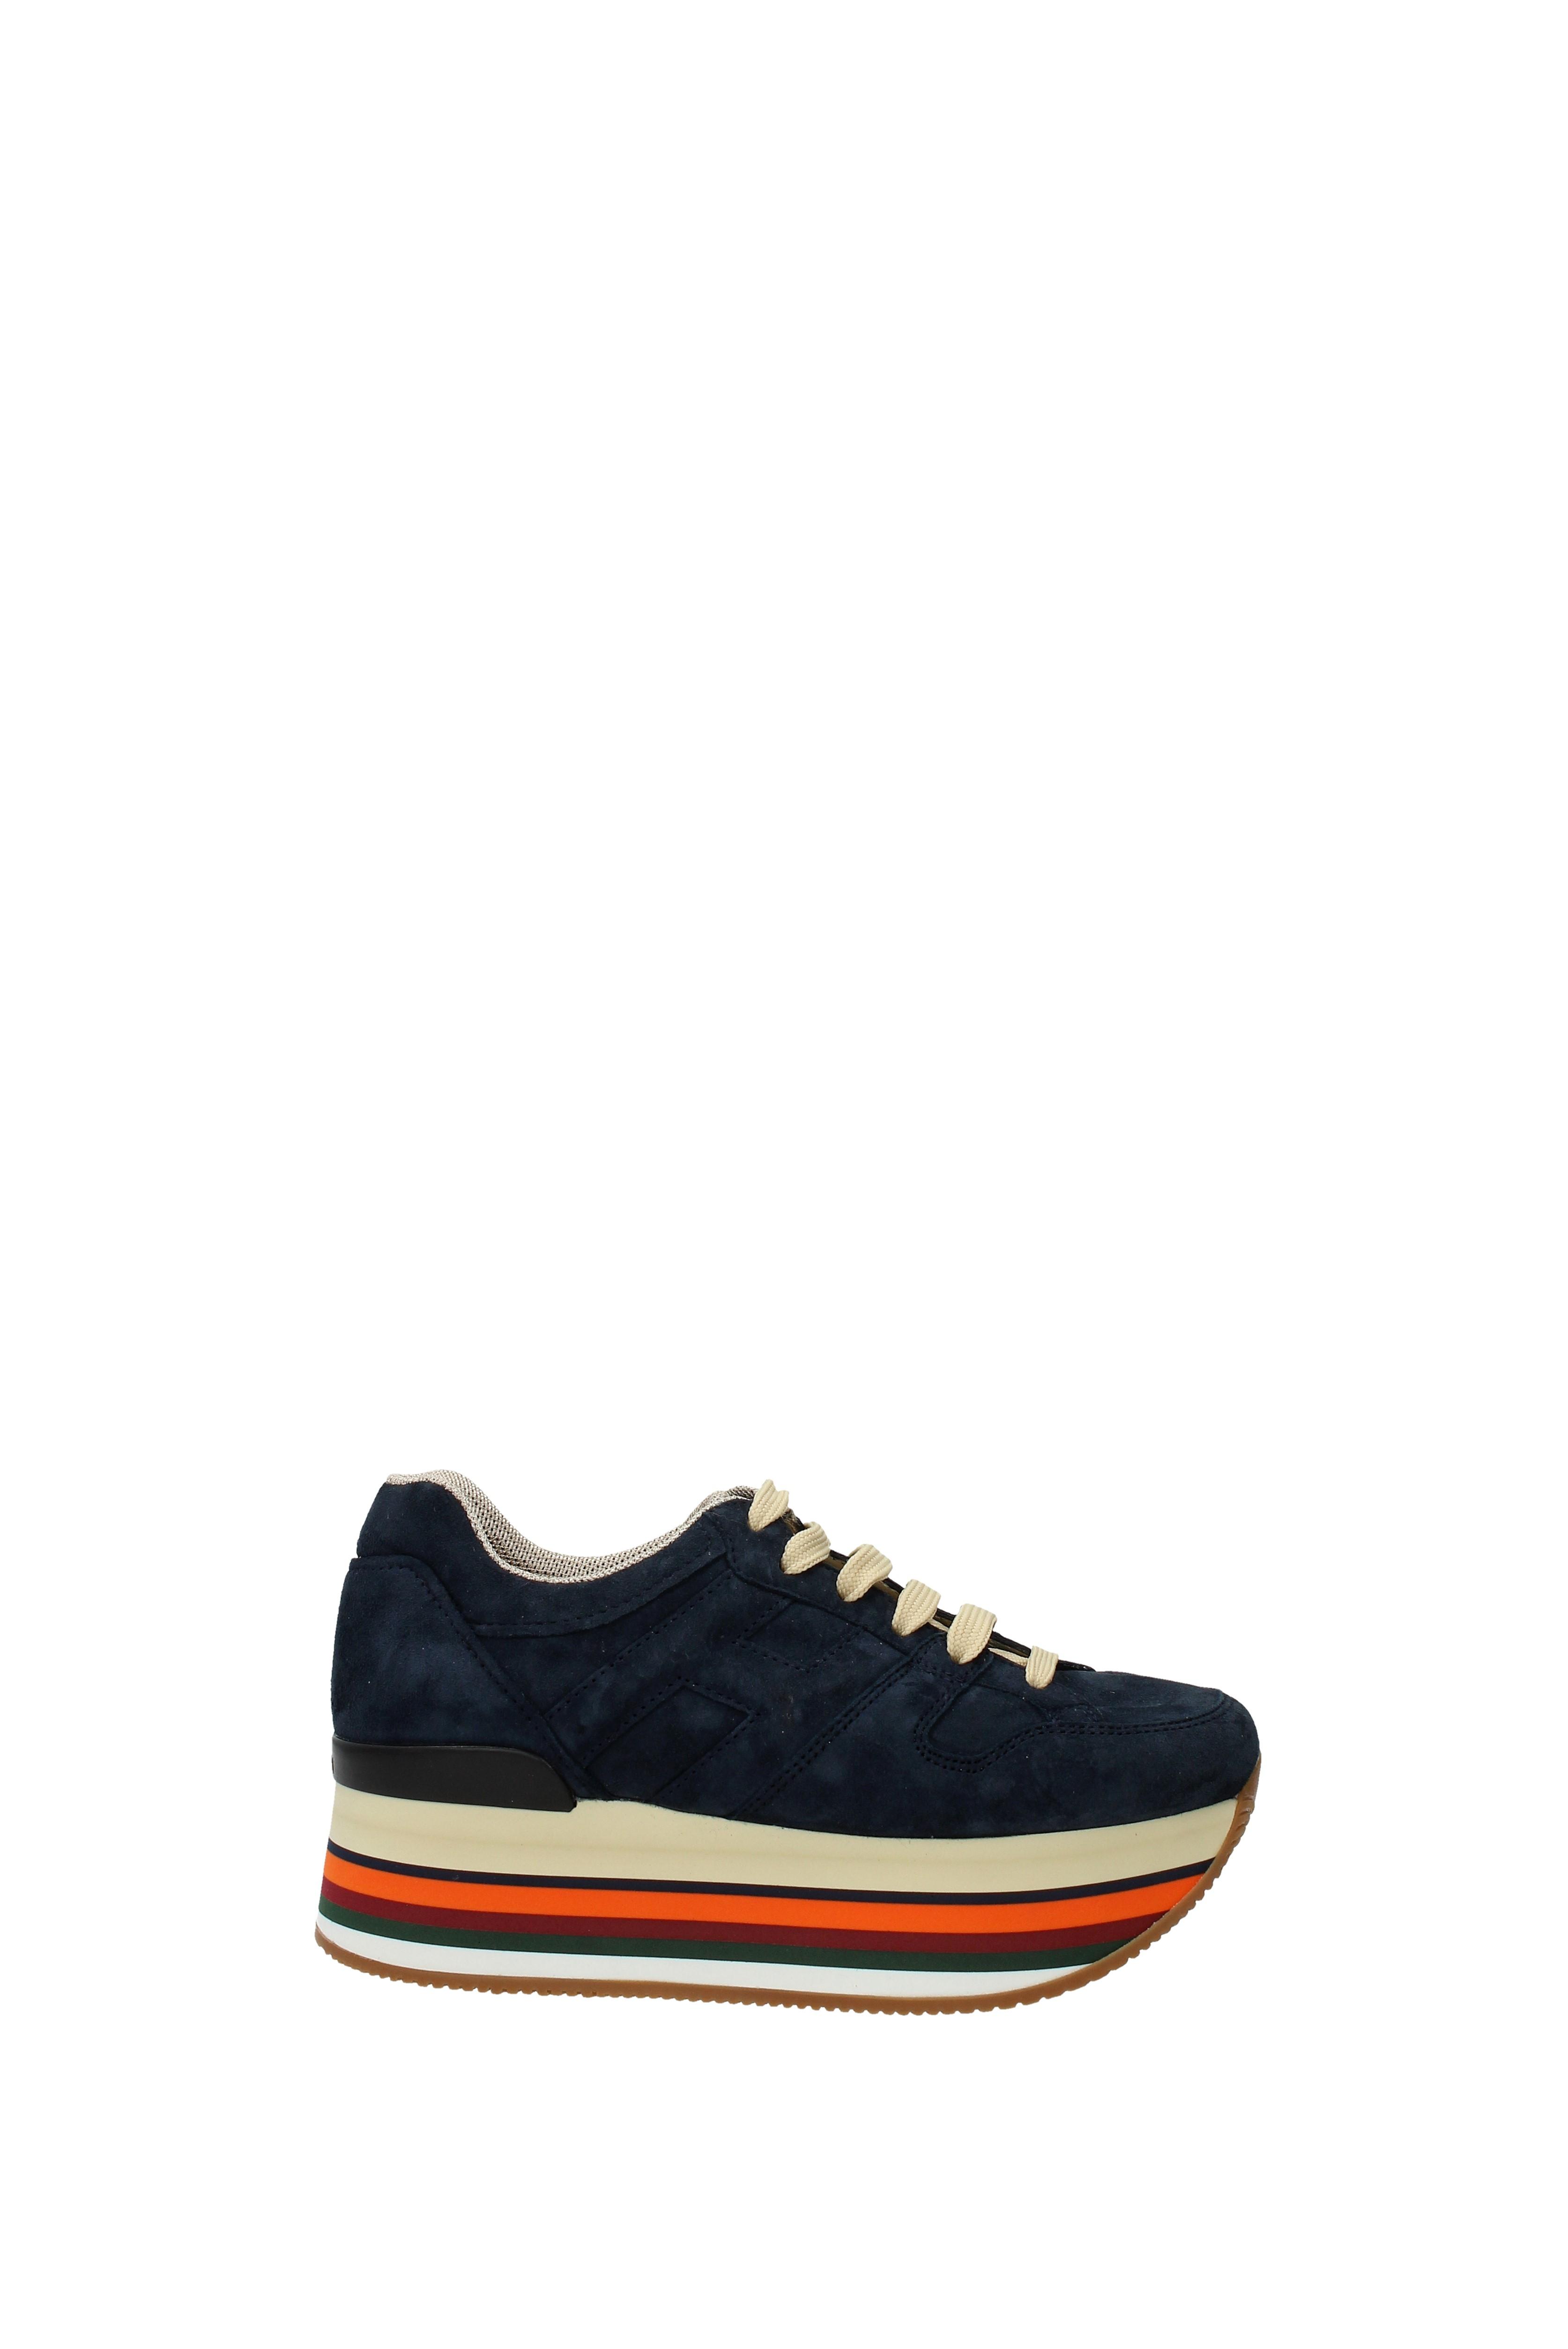 Alta qualit Sneakers Hogan Donna Camoscio HXW2830T543CR0 vendita -  mainstreetblytheville.org cdd5ed470c9